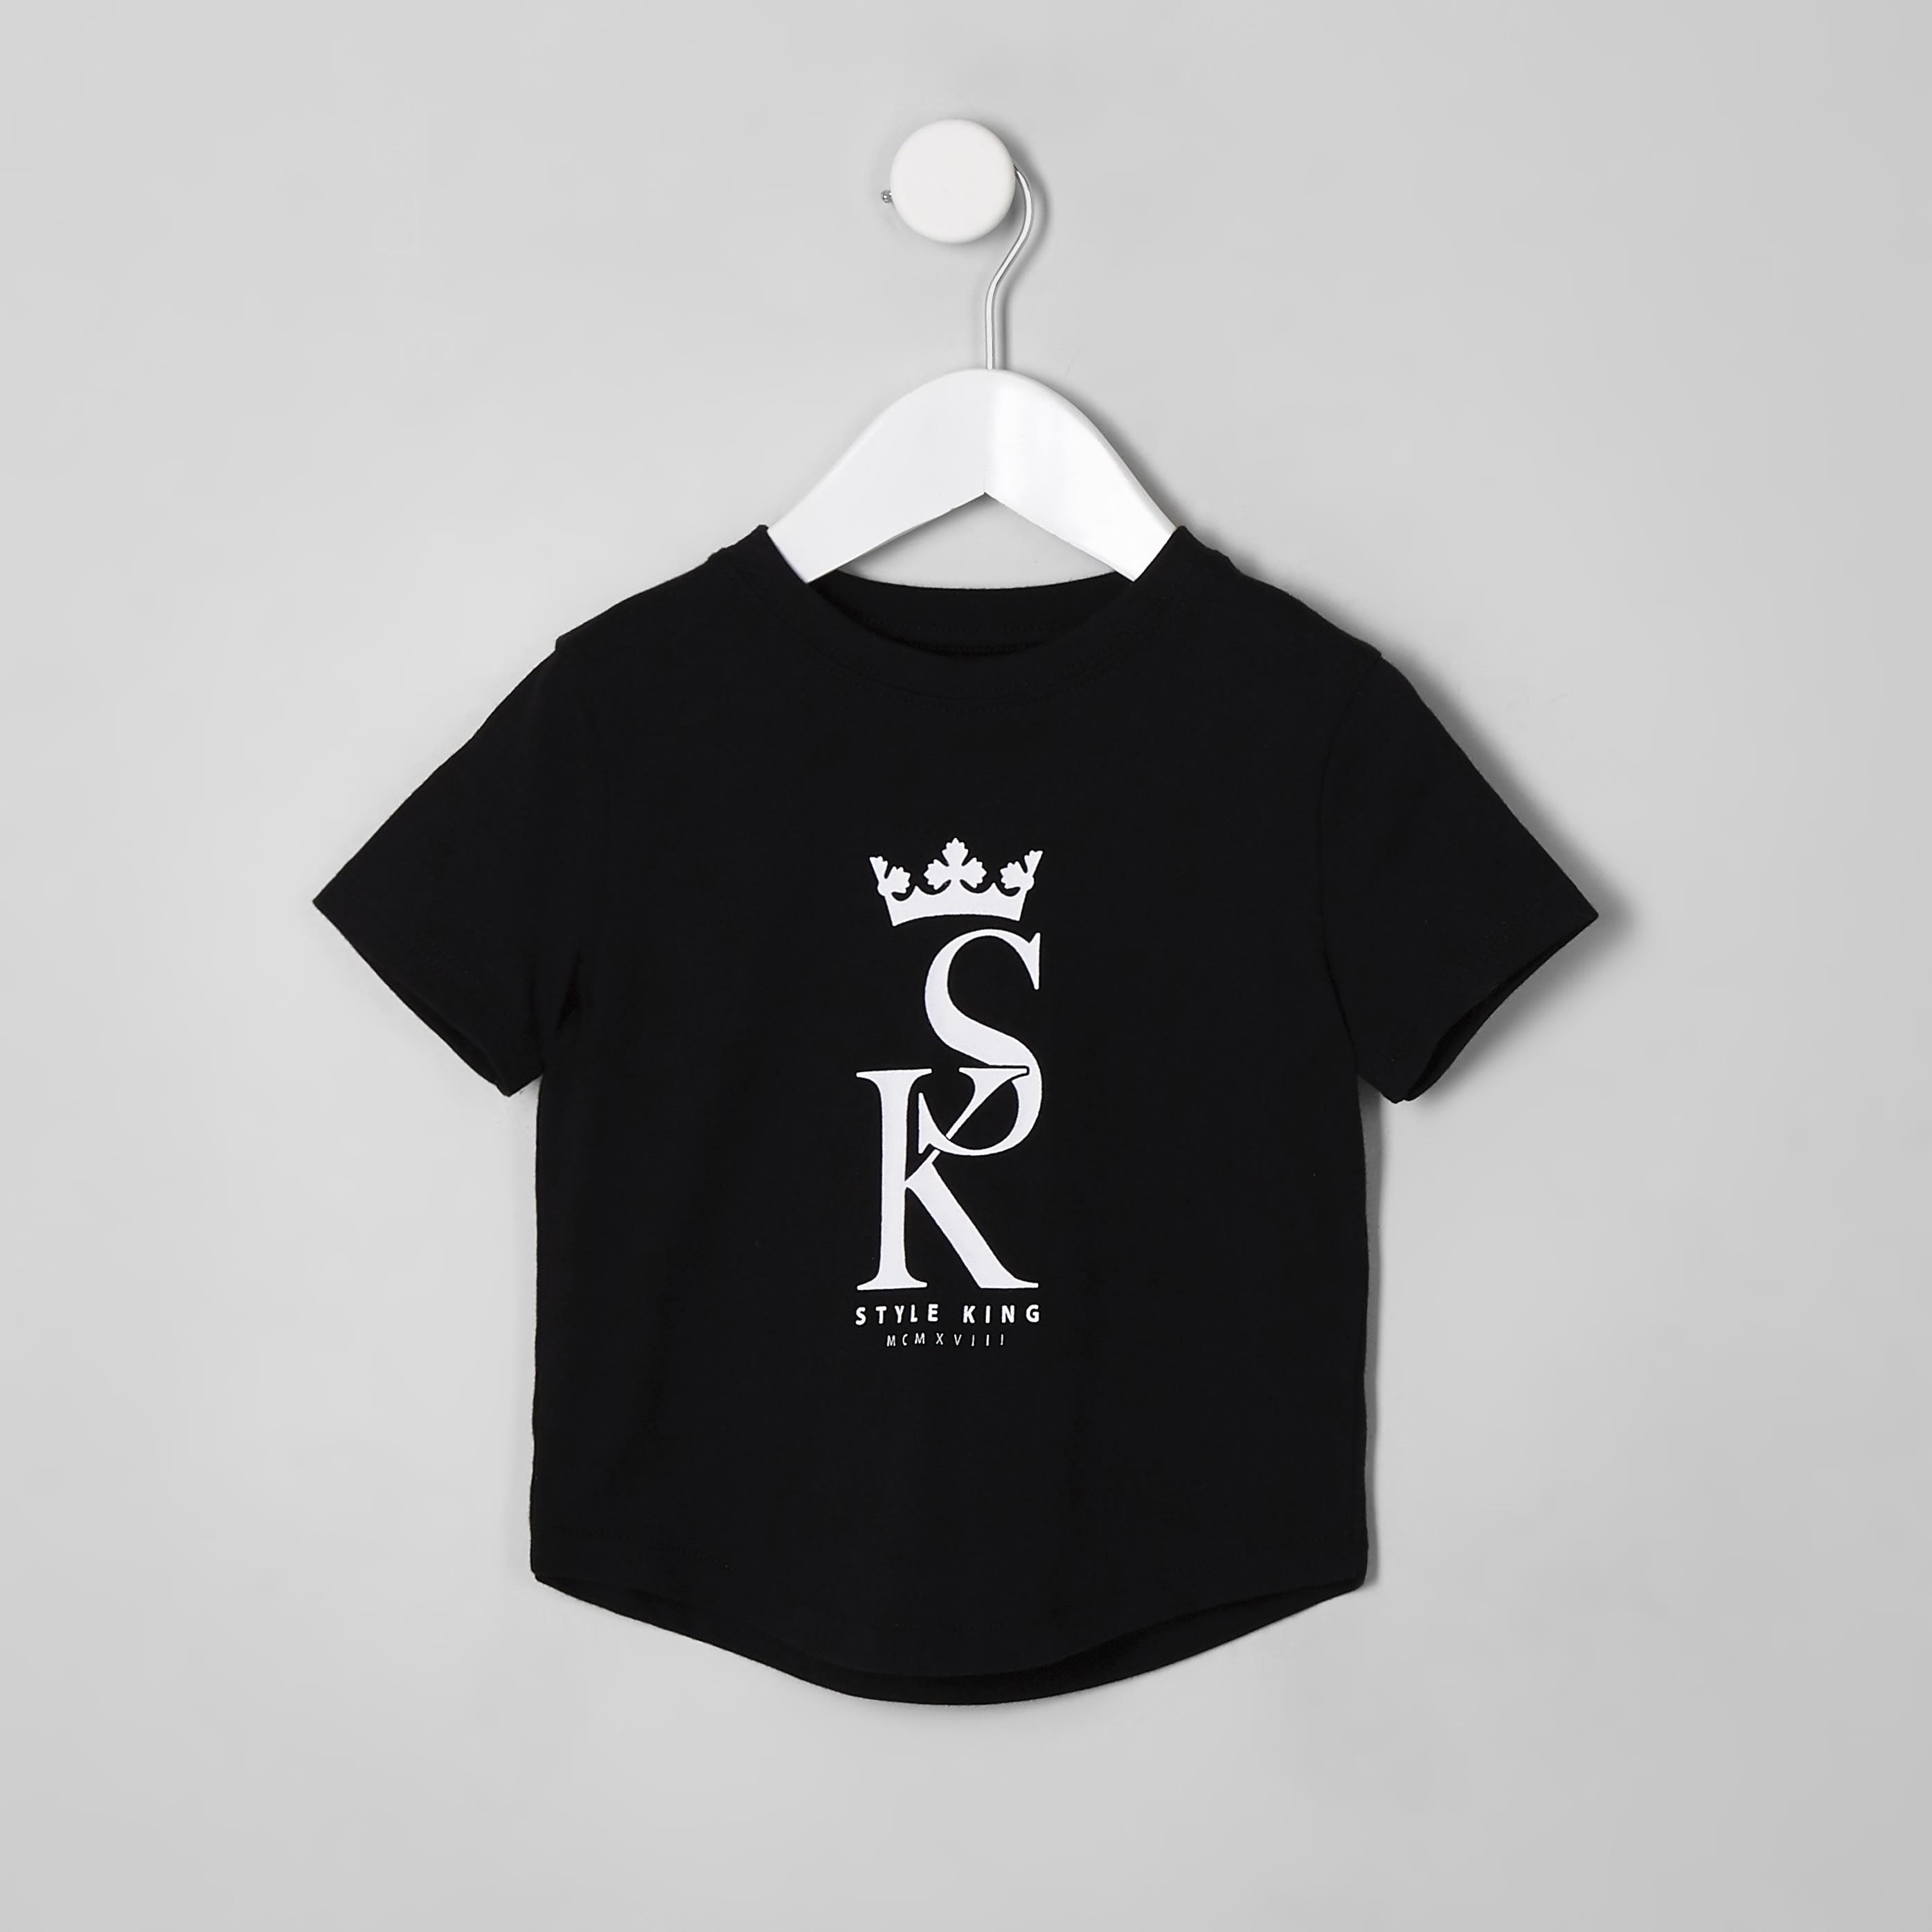 River Island Mens Baby Boys Black 'style king' T-shirt (18-24 Mths)